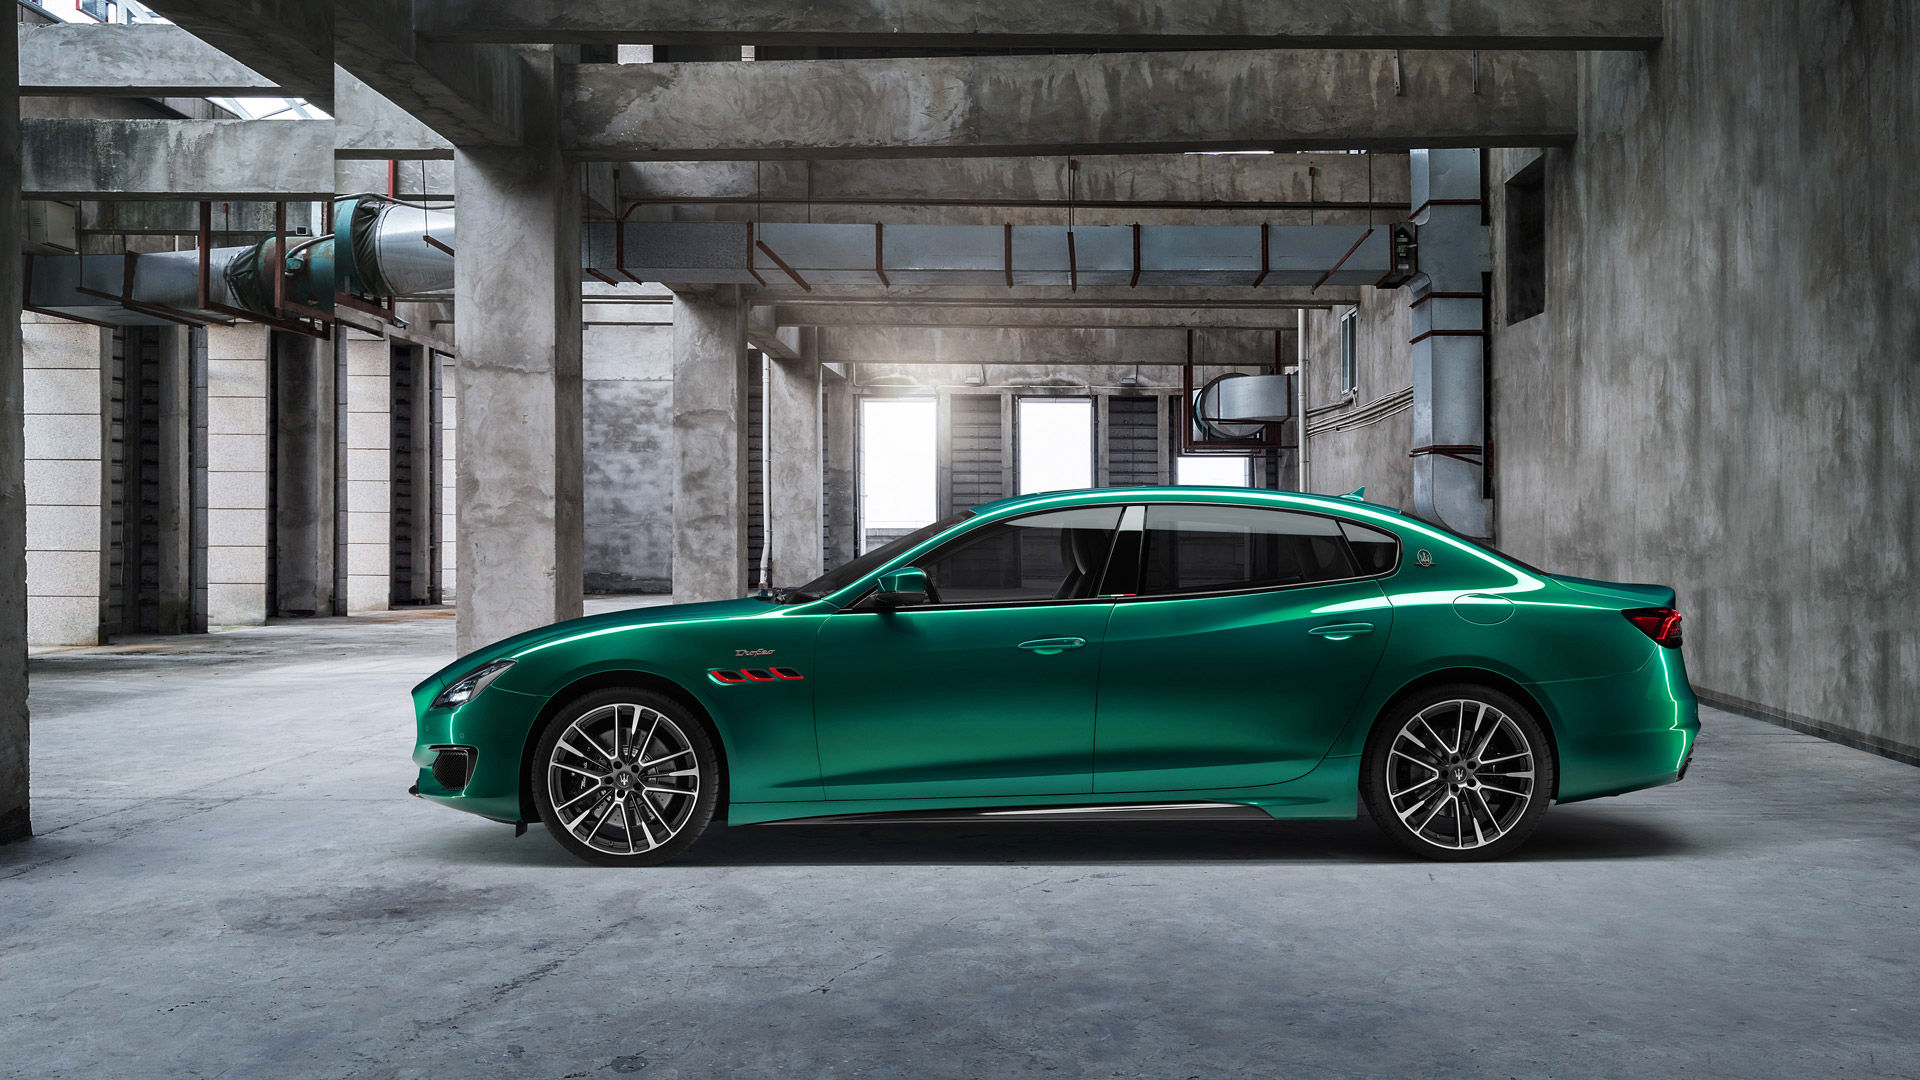 Maserati Quattroporte Trofeo in Grün - Seitenansicht